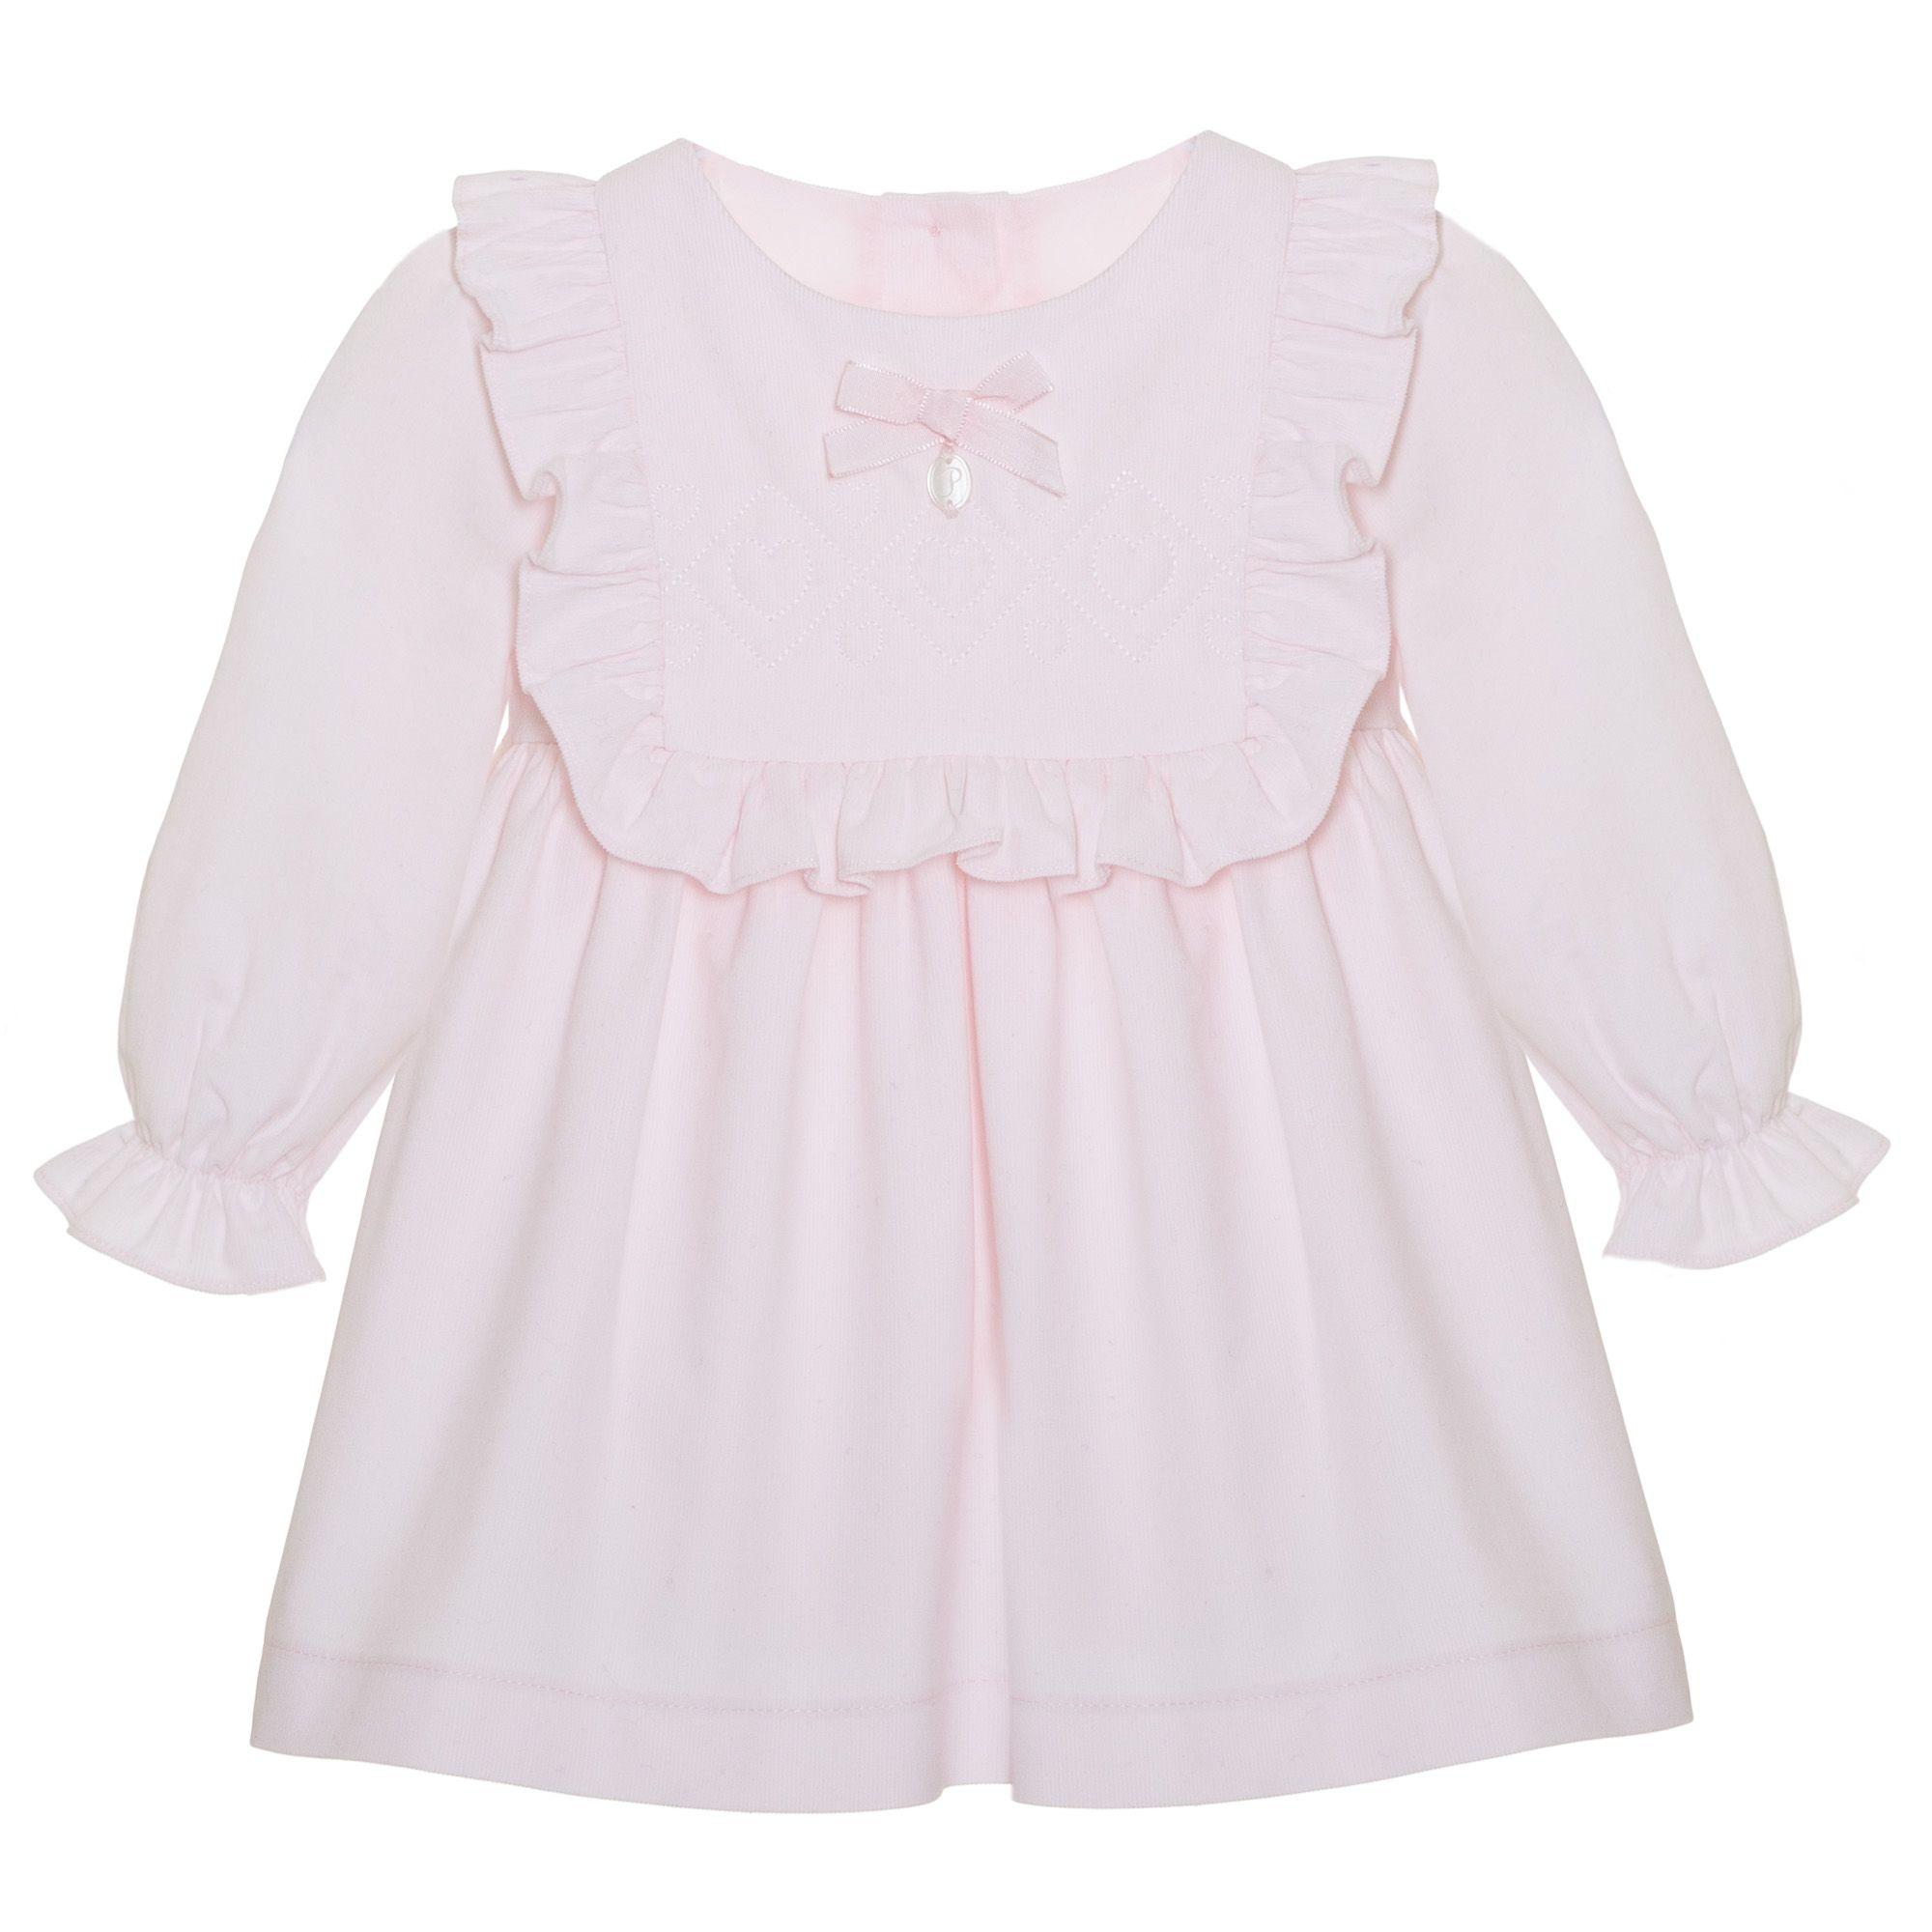 Patachou Patachou Girls Cord Dress - 3039 AW21